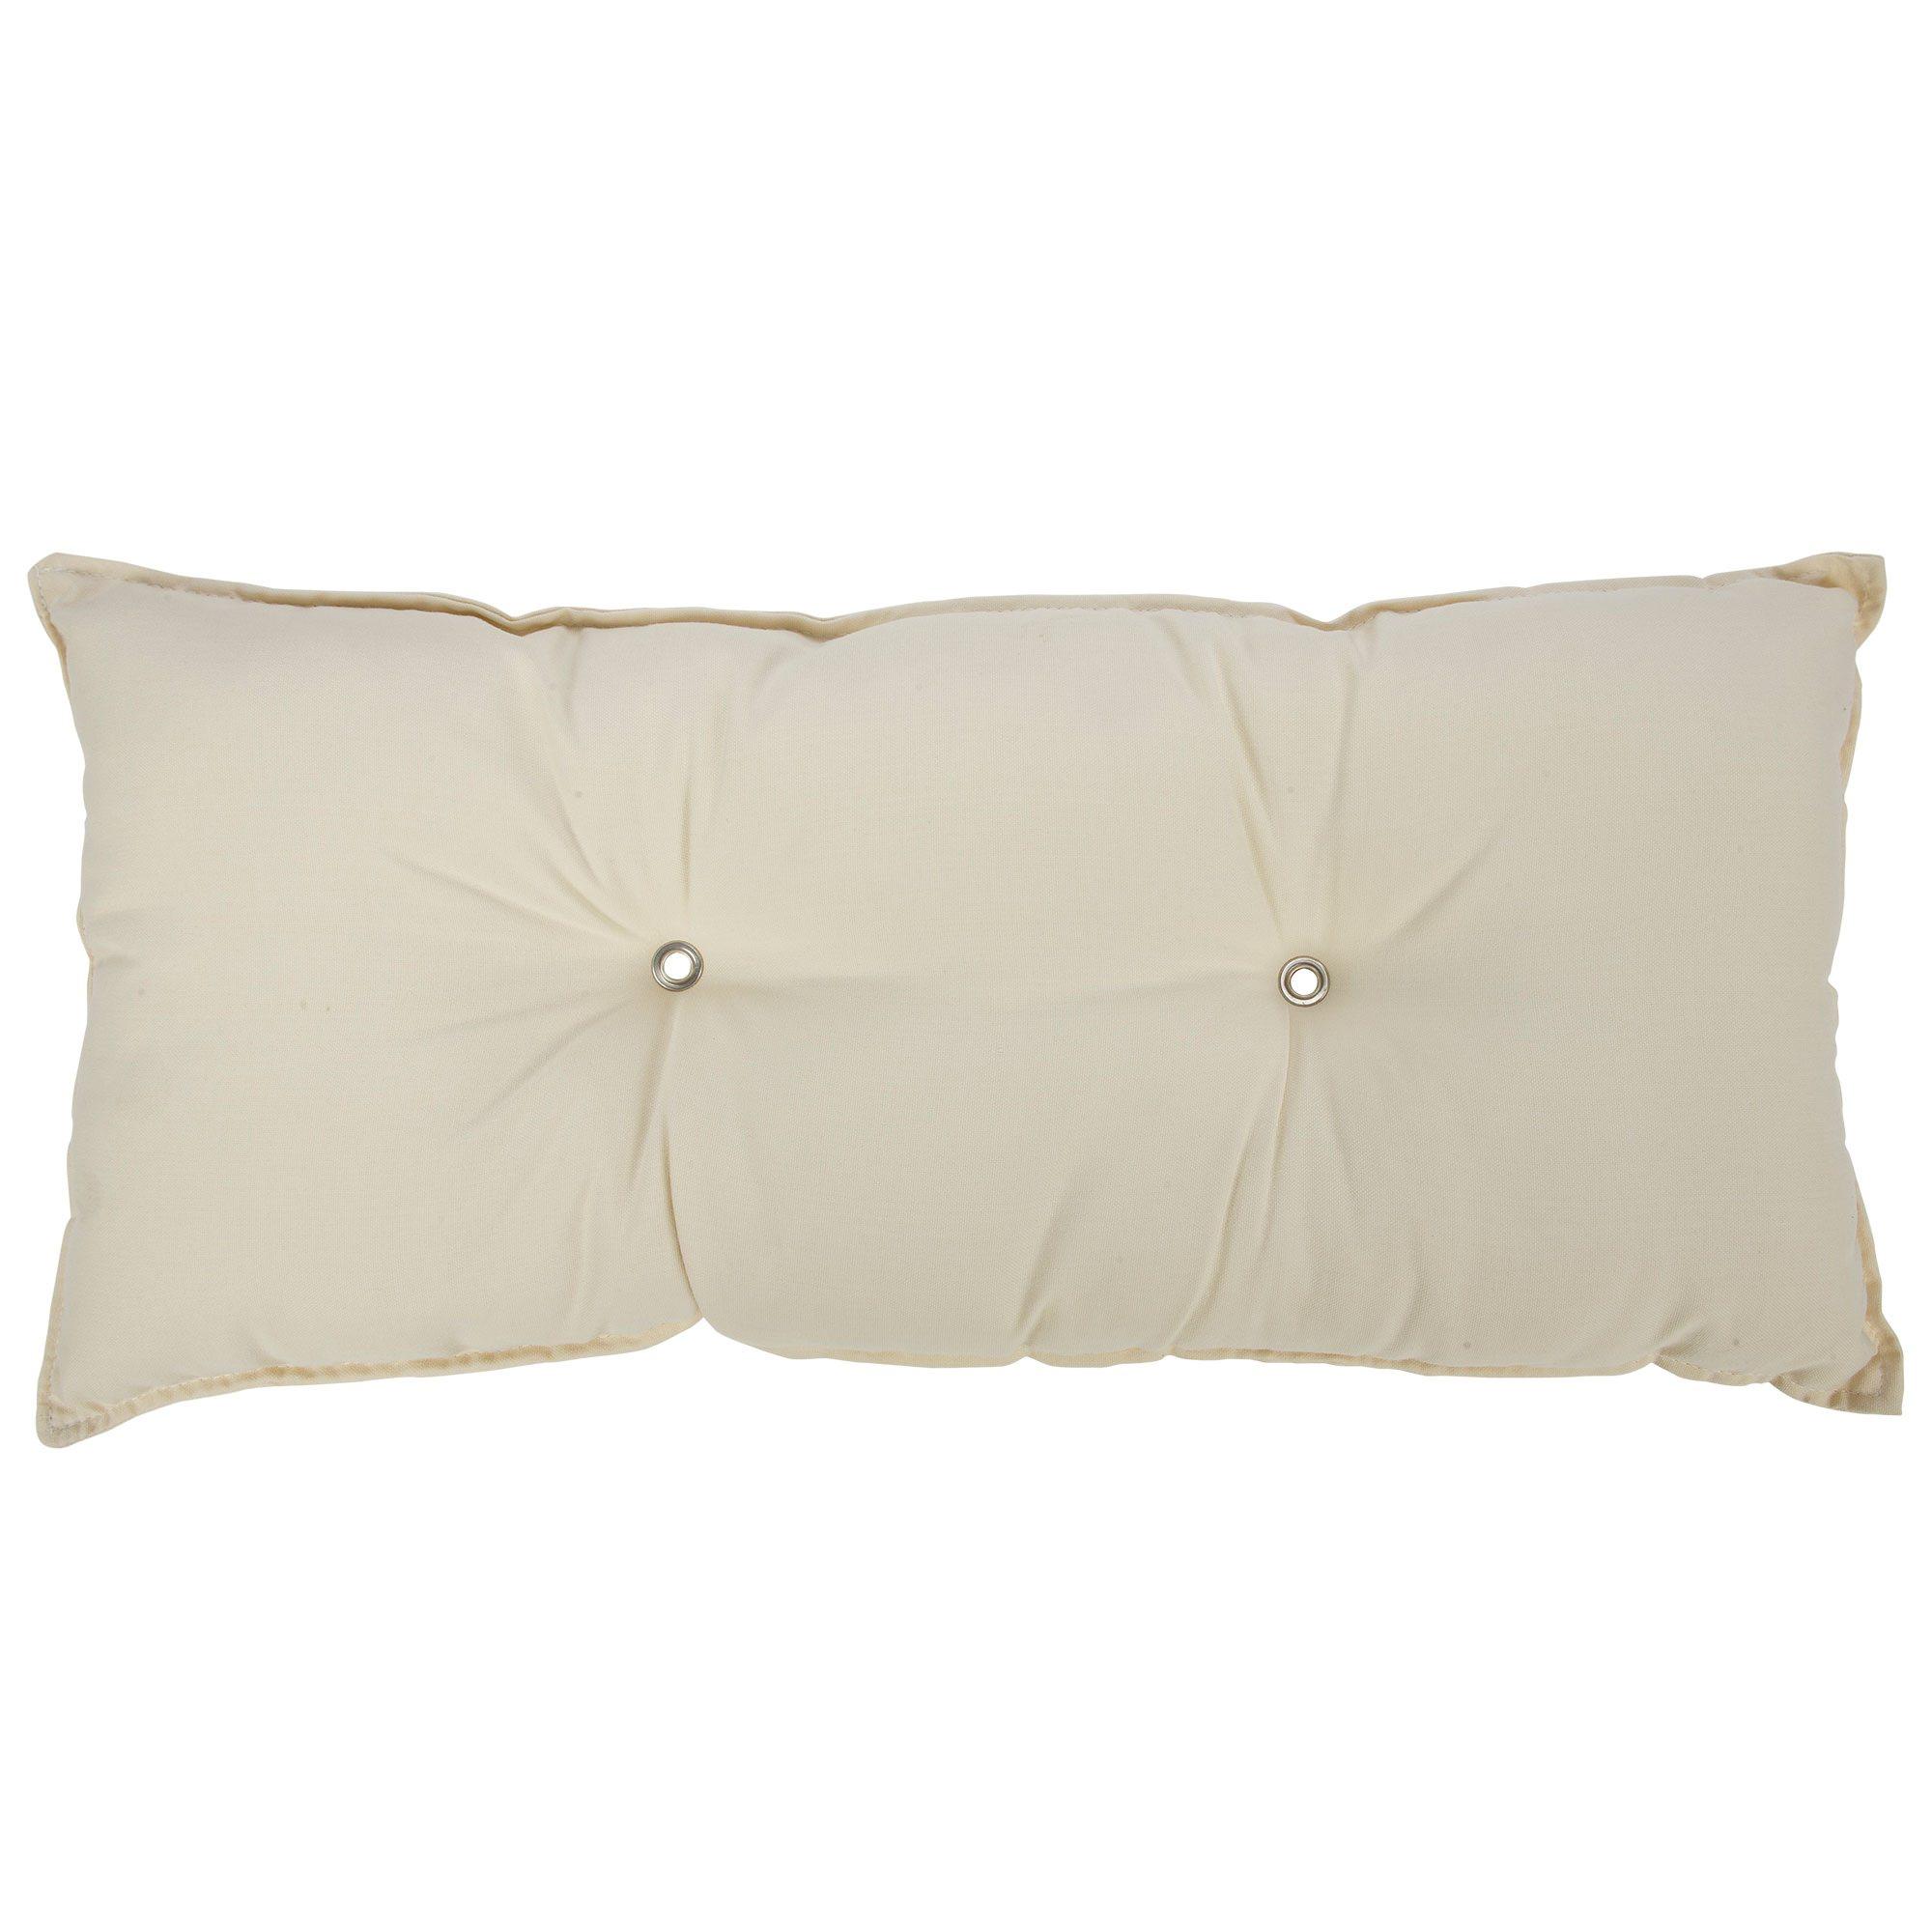 Tufted Hammock Pillow Cream B T11